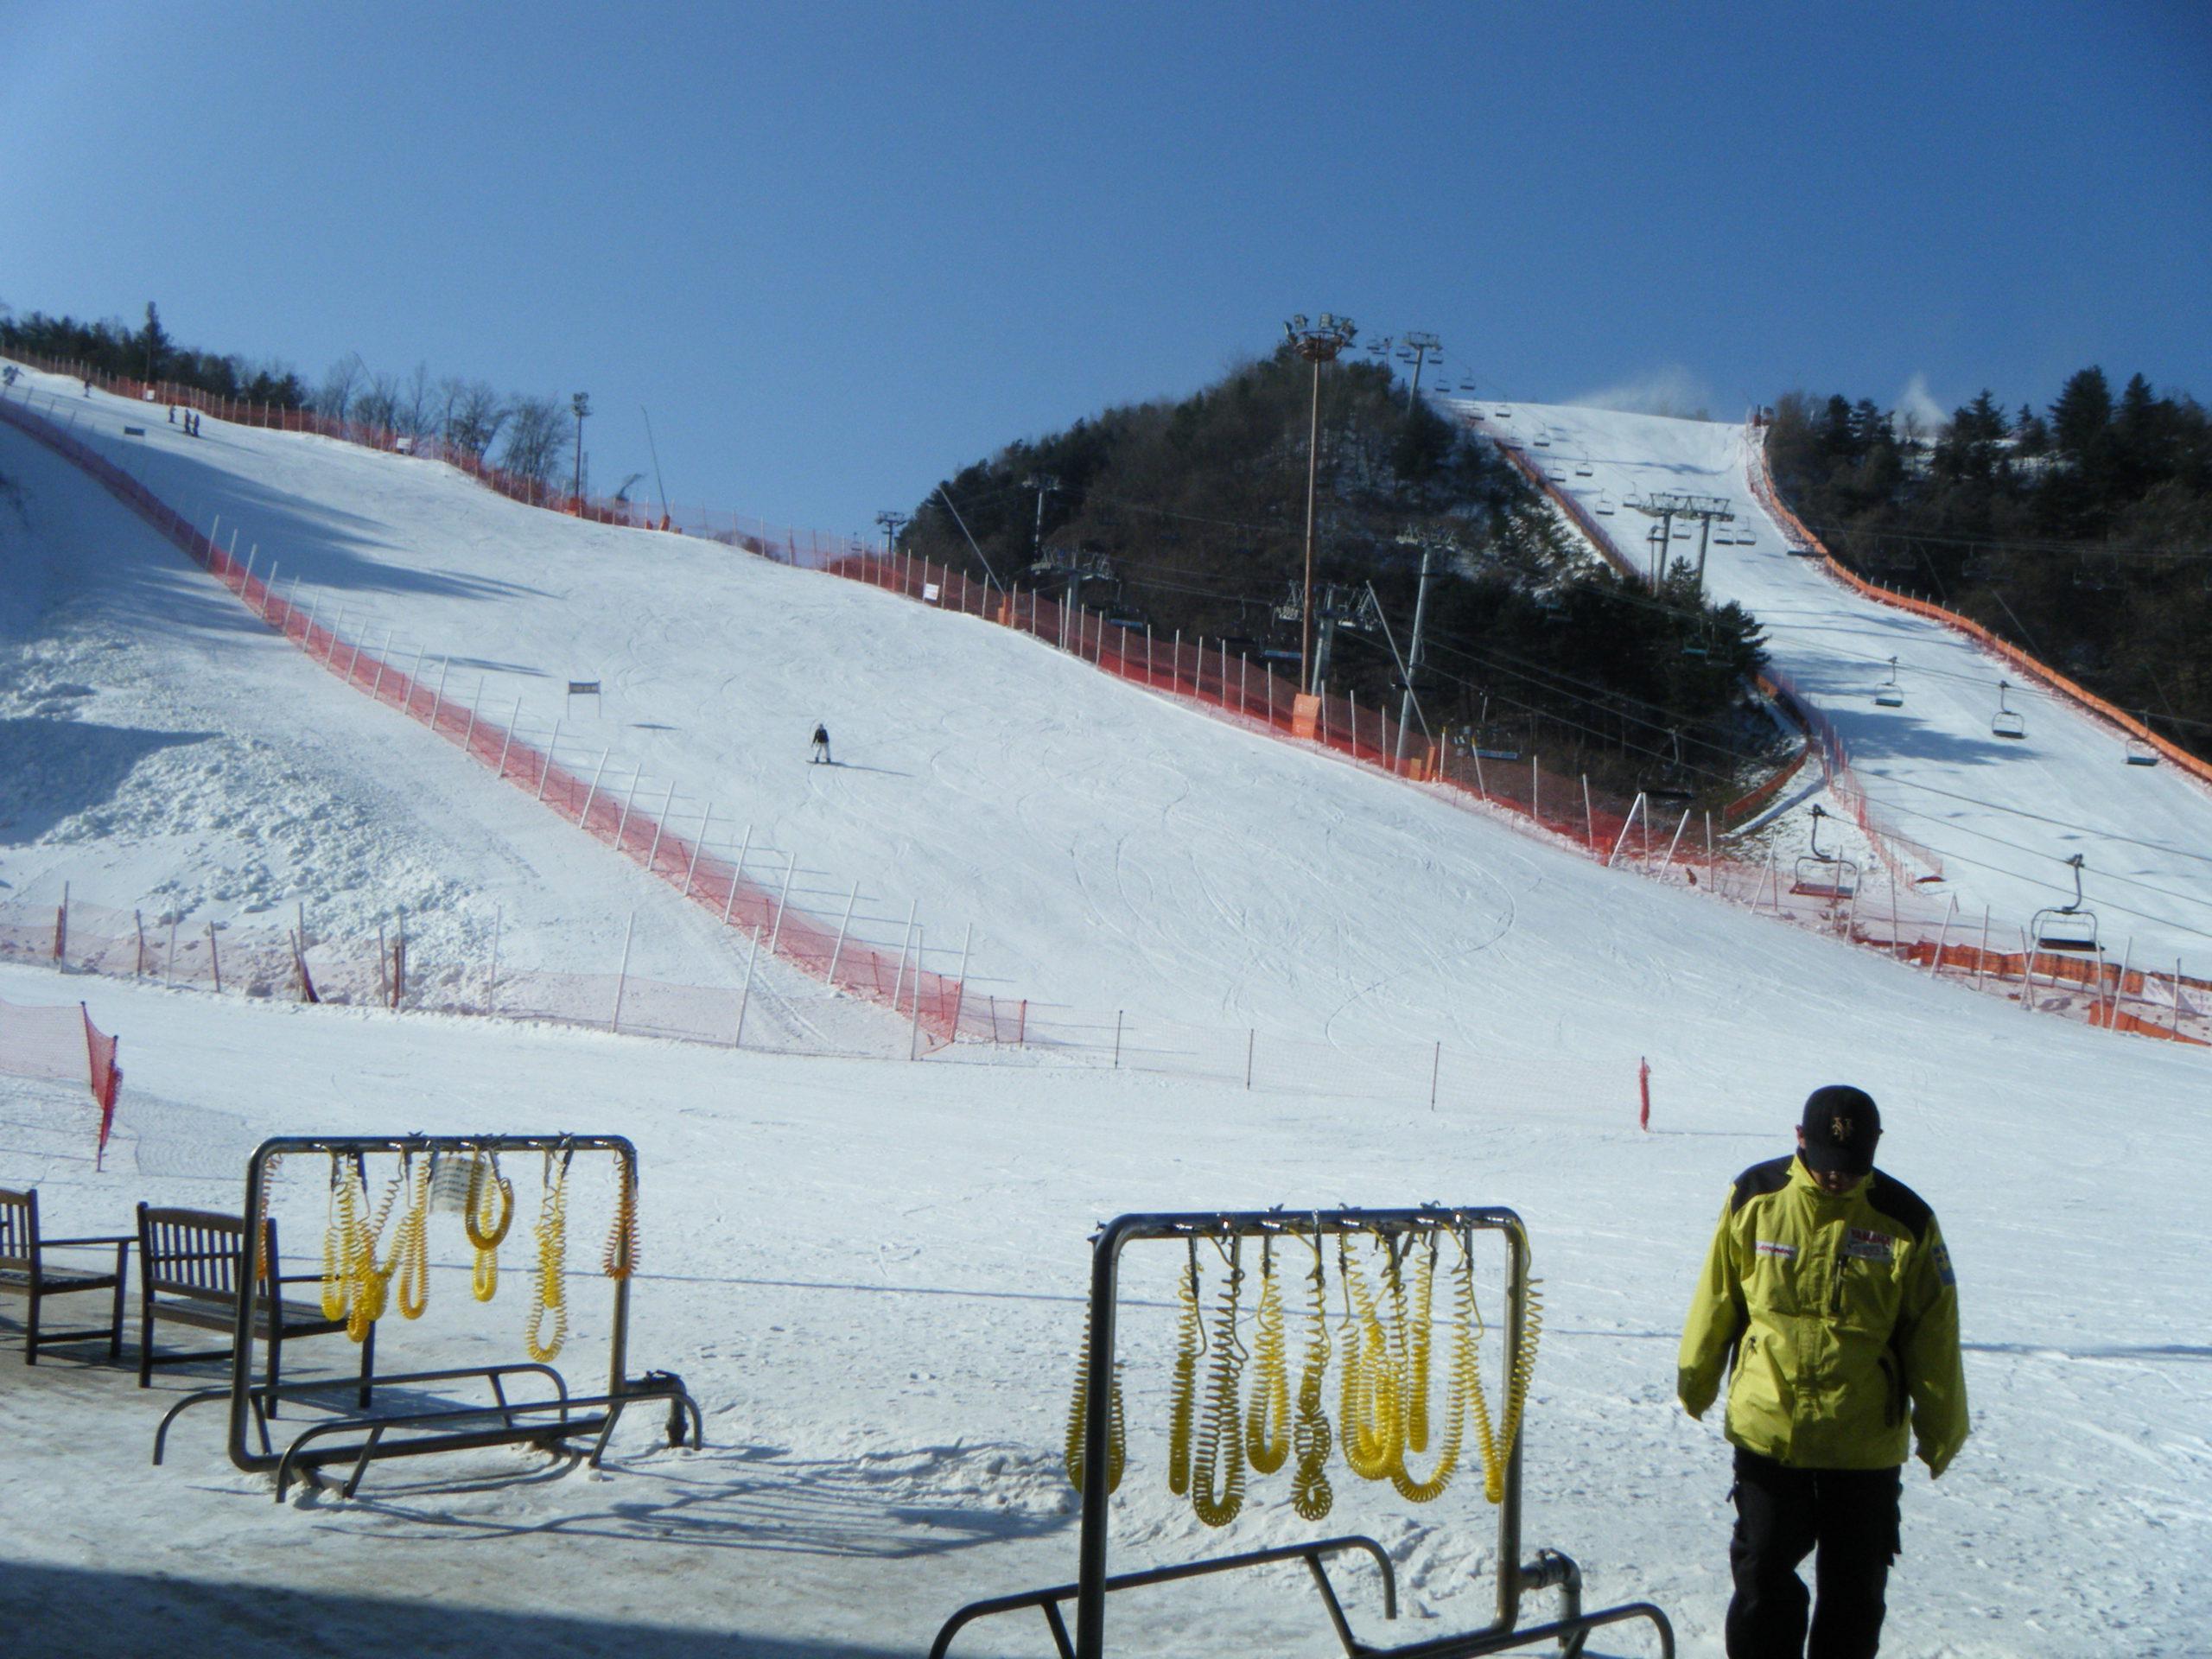 Korean ski resort